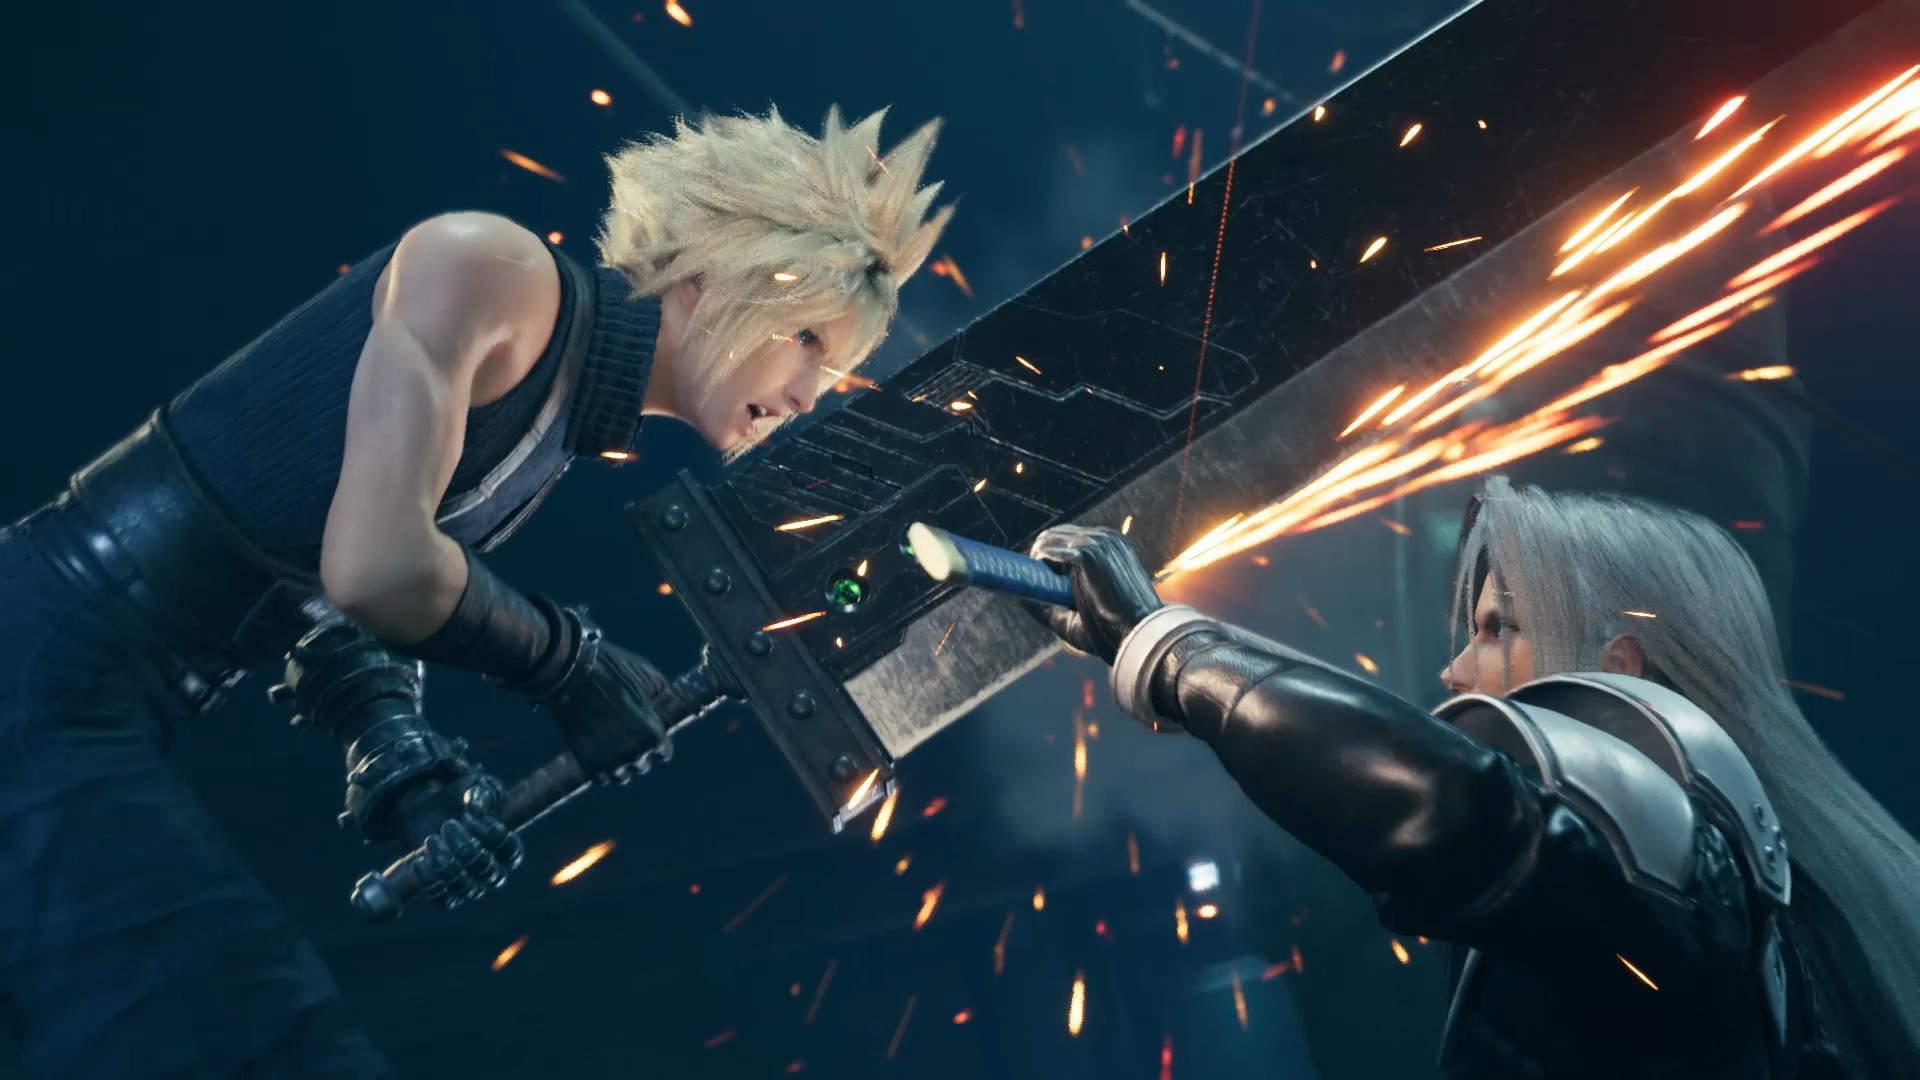 SE执行官:仍会为《最终幻想7:重制版》4月10日发售日期努力工作